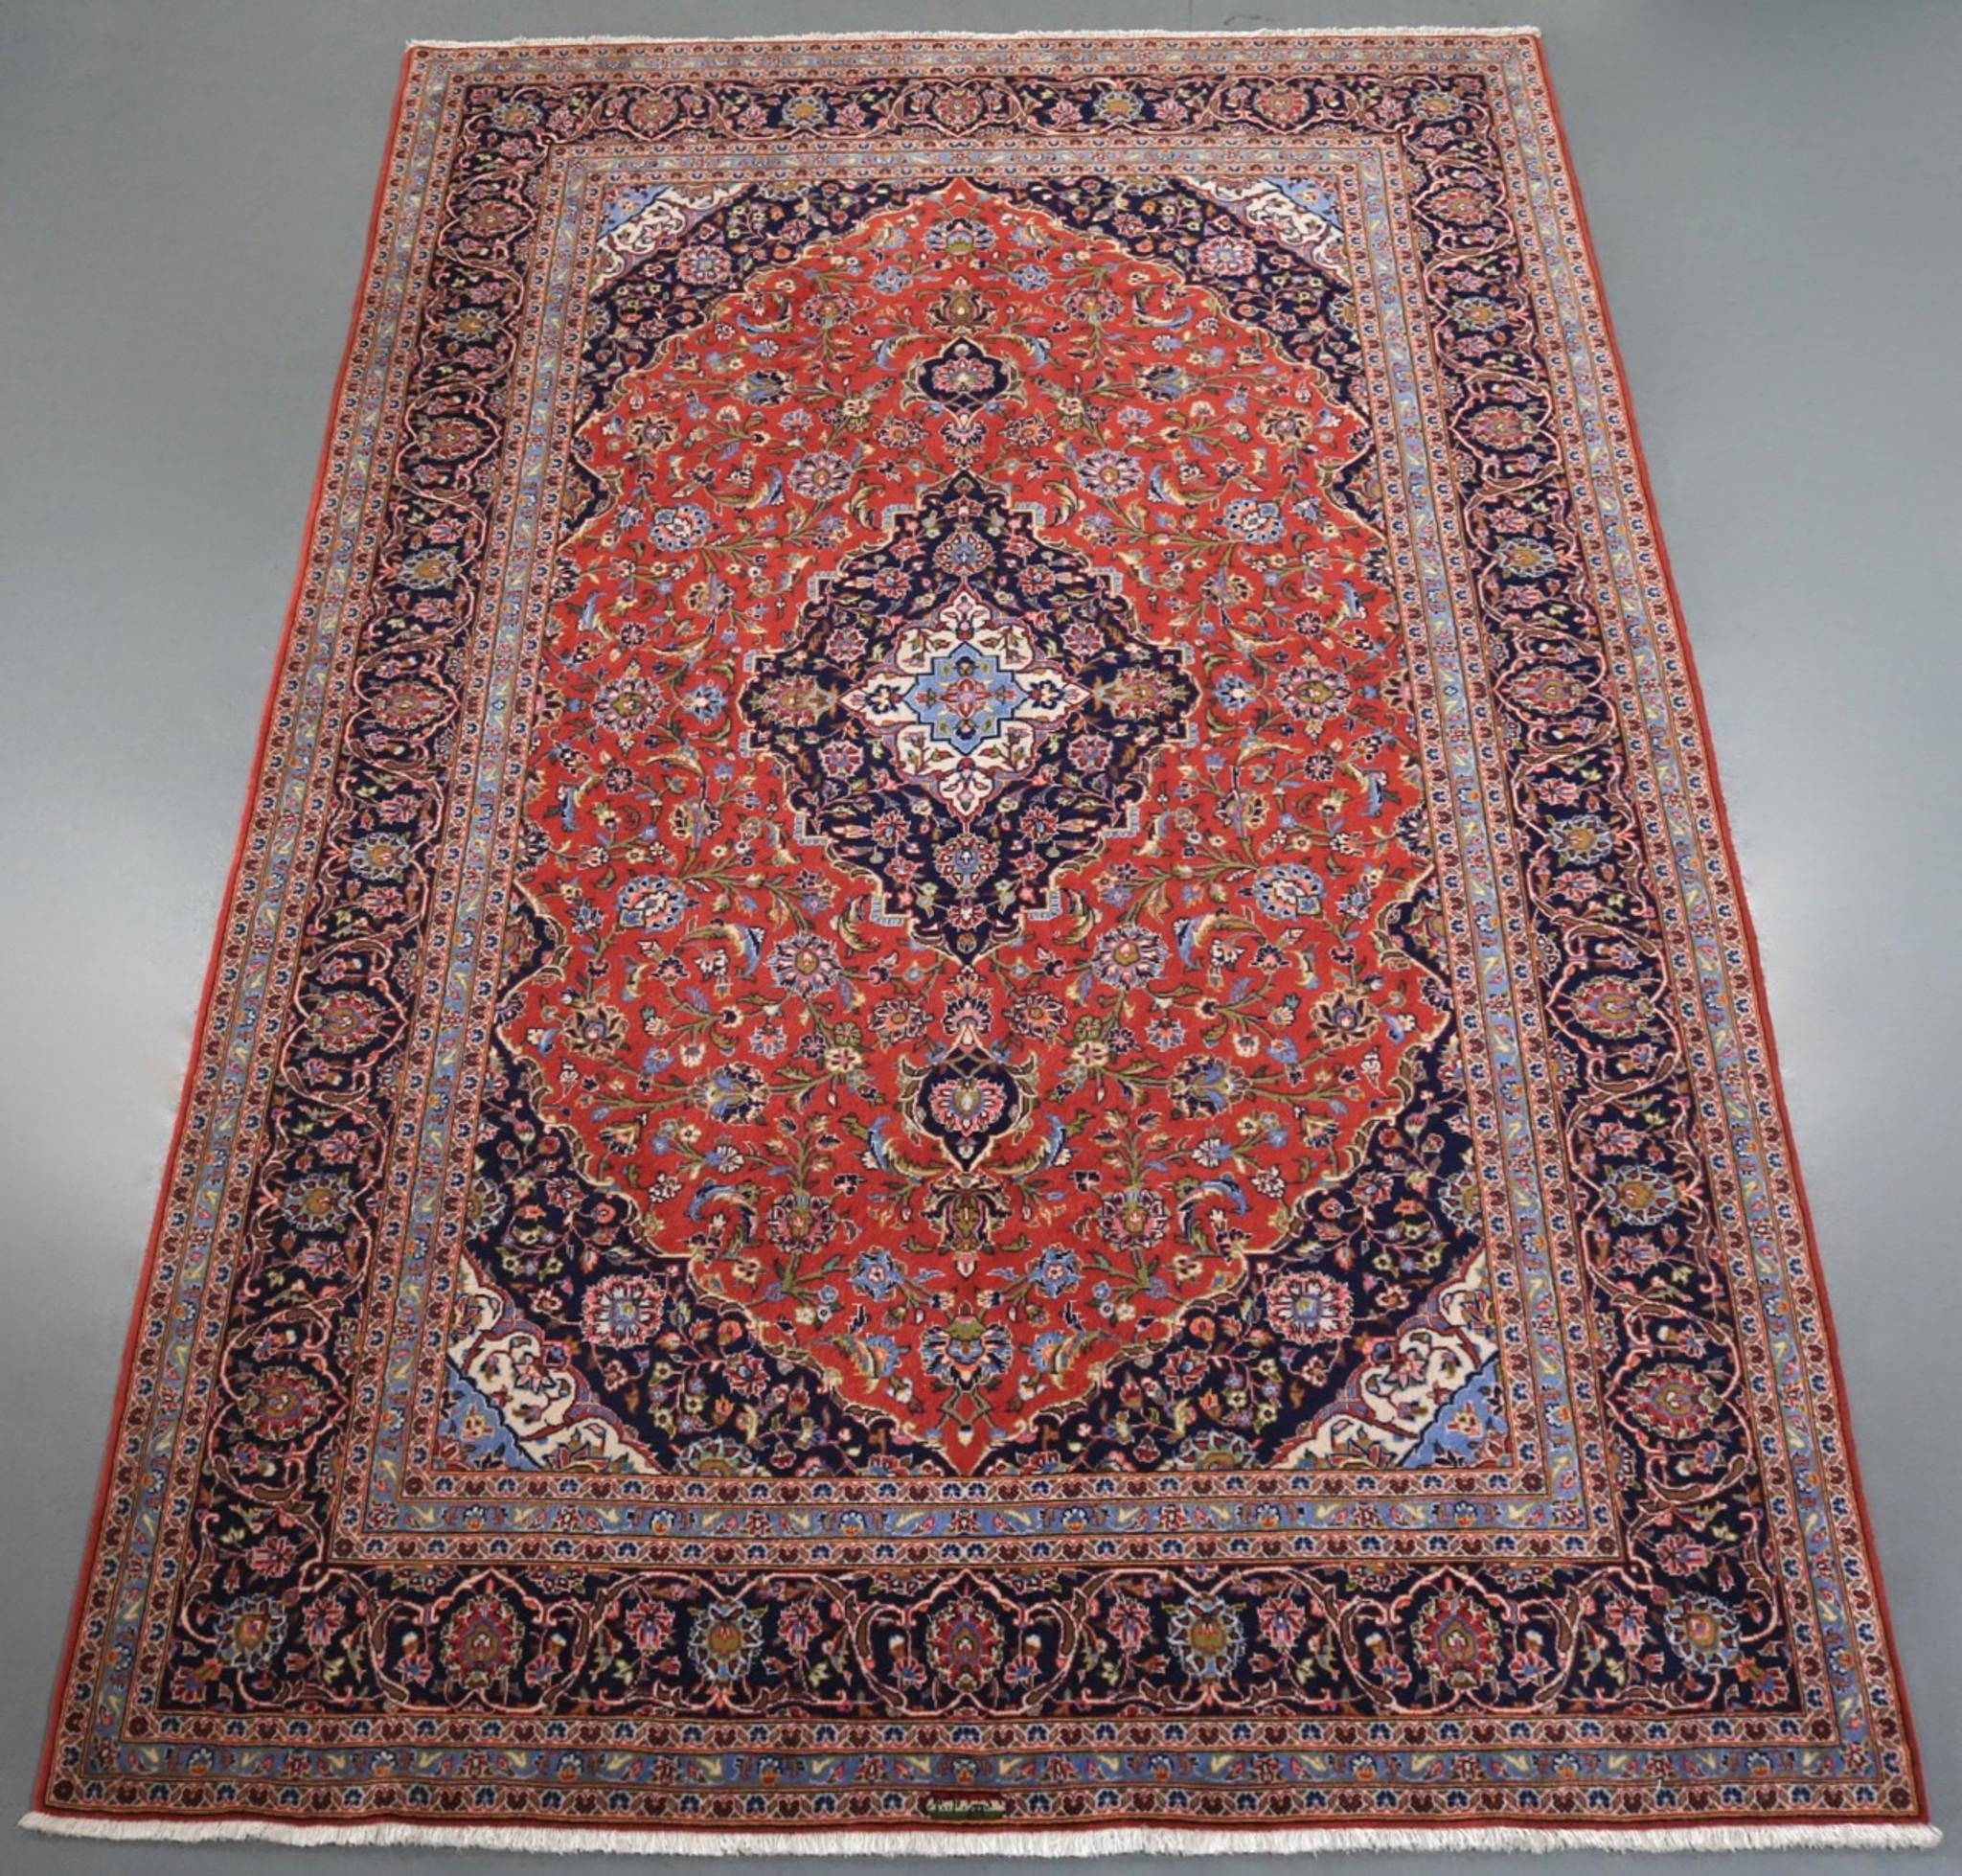 Persian Rugs Australia: Kashan Kork Wool Persian Rug (Ref 63) 327x204cm